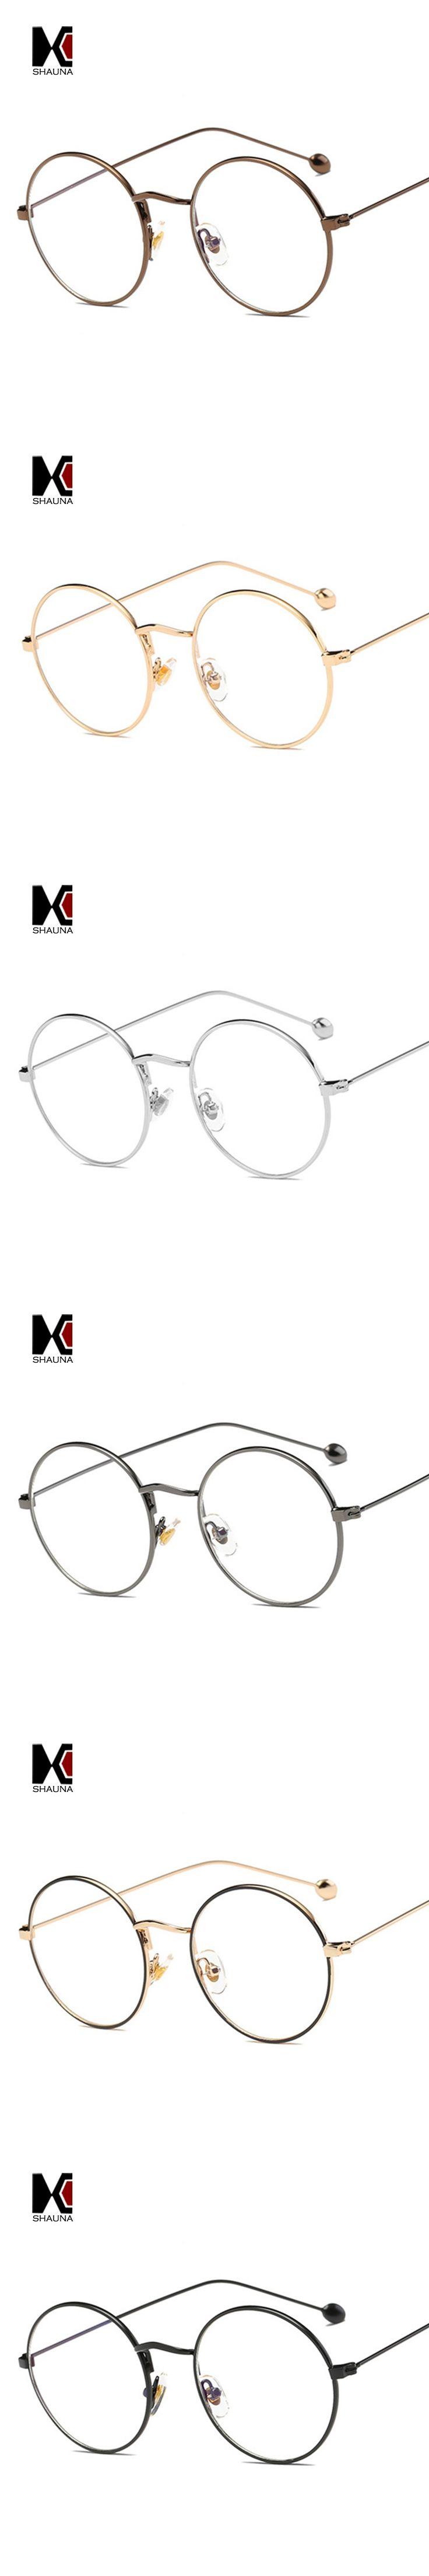 SHAUNA Super Round Women Metal Glasses Frame Fashion Men Clear Lens Eyeglasses